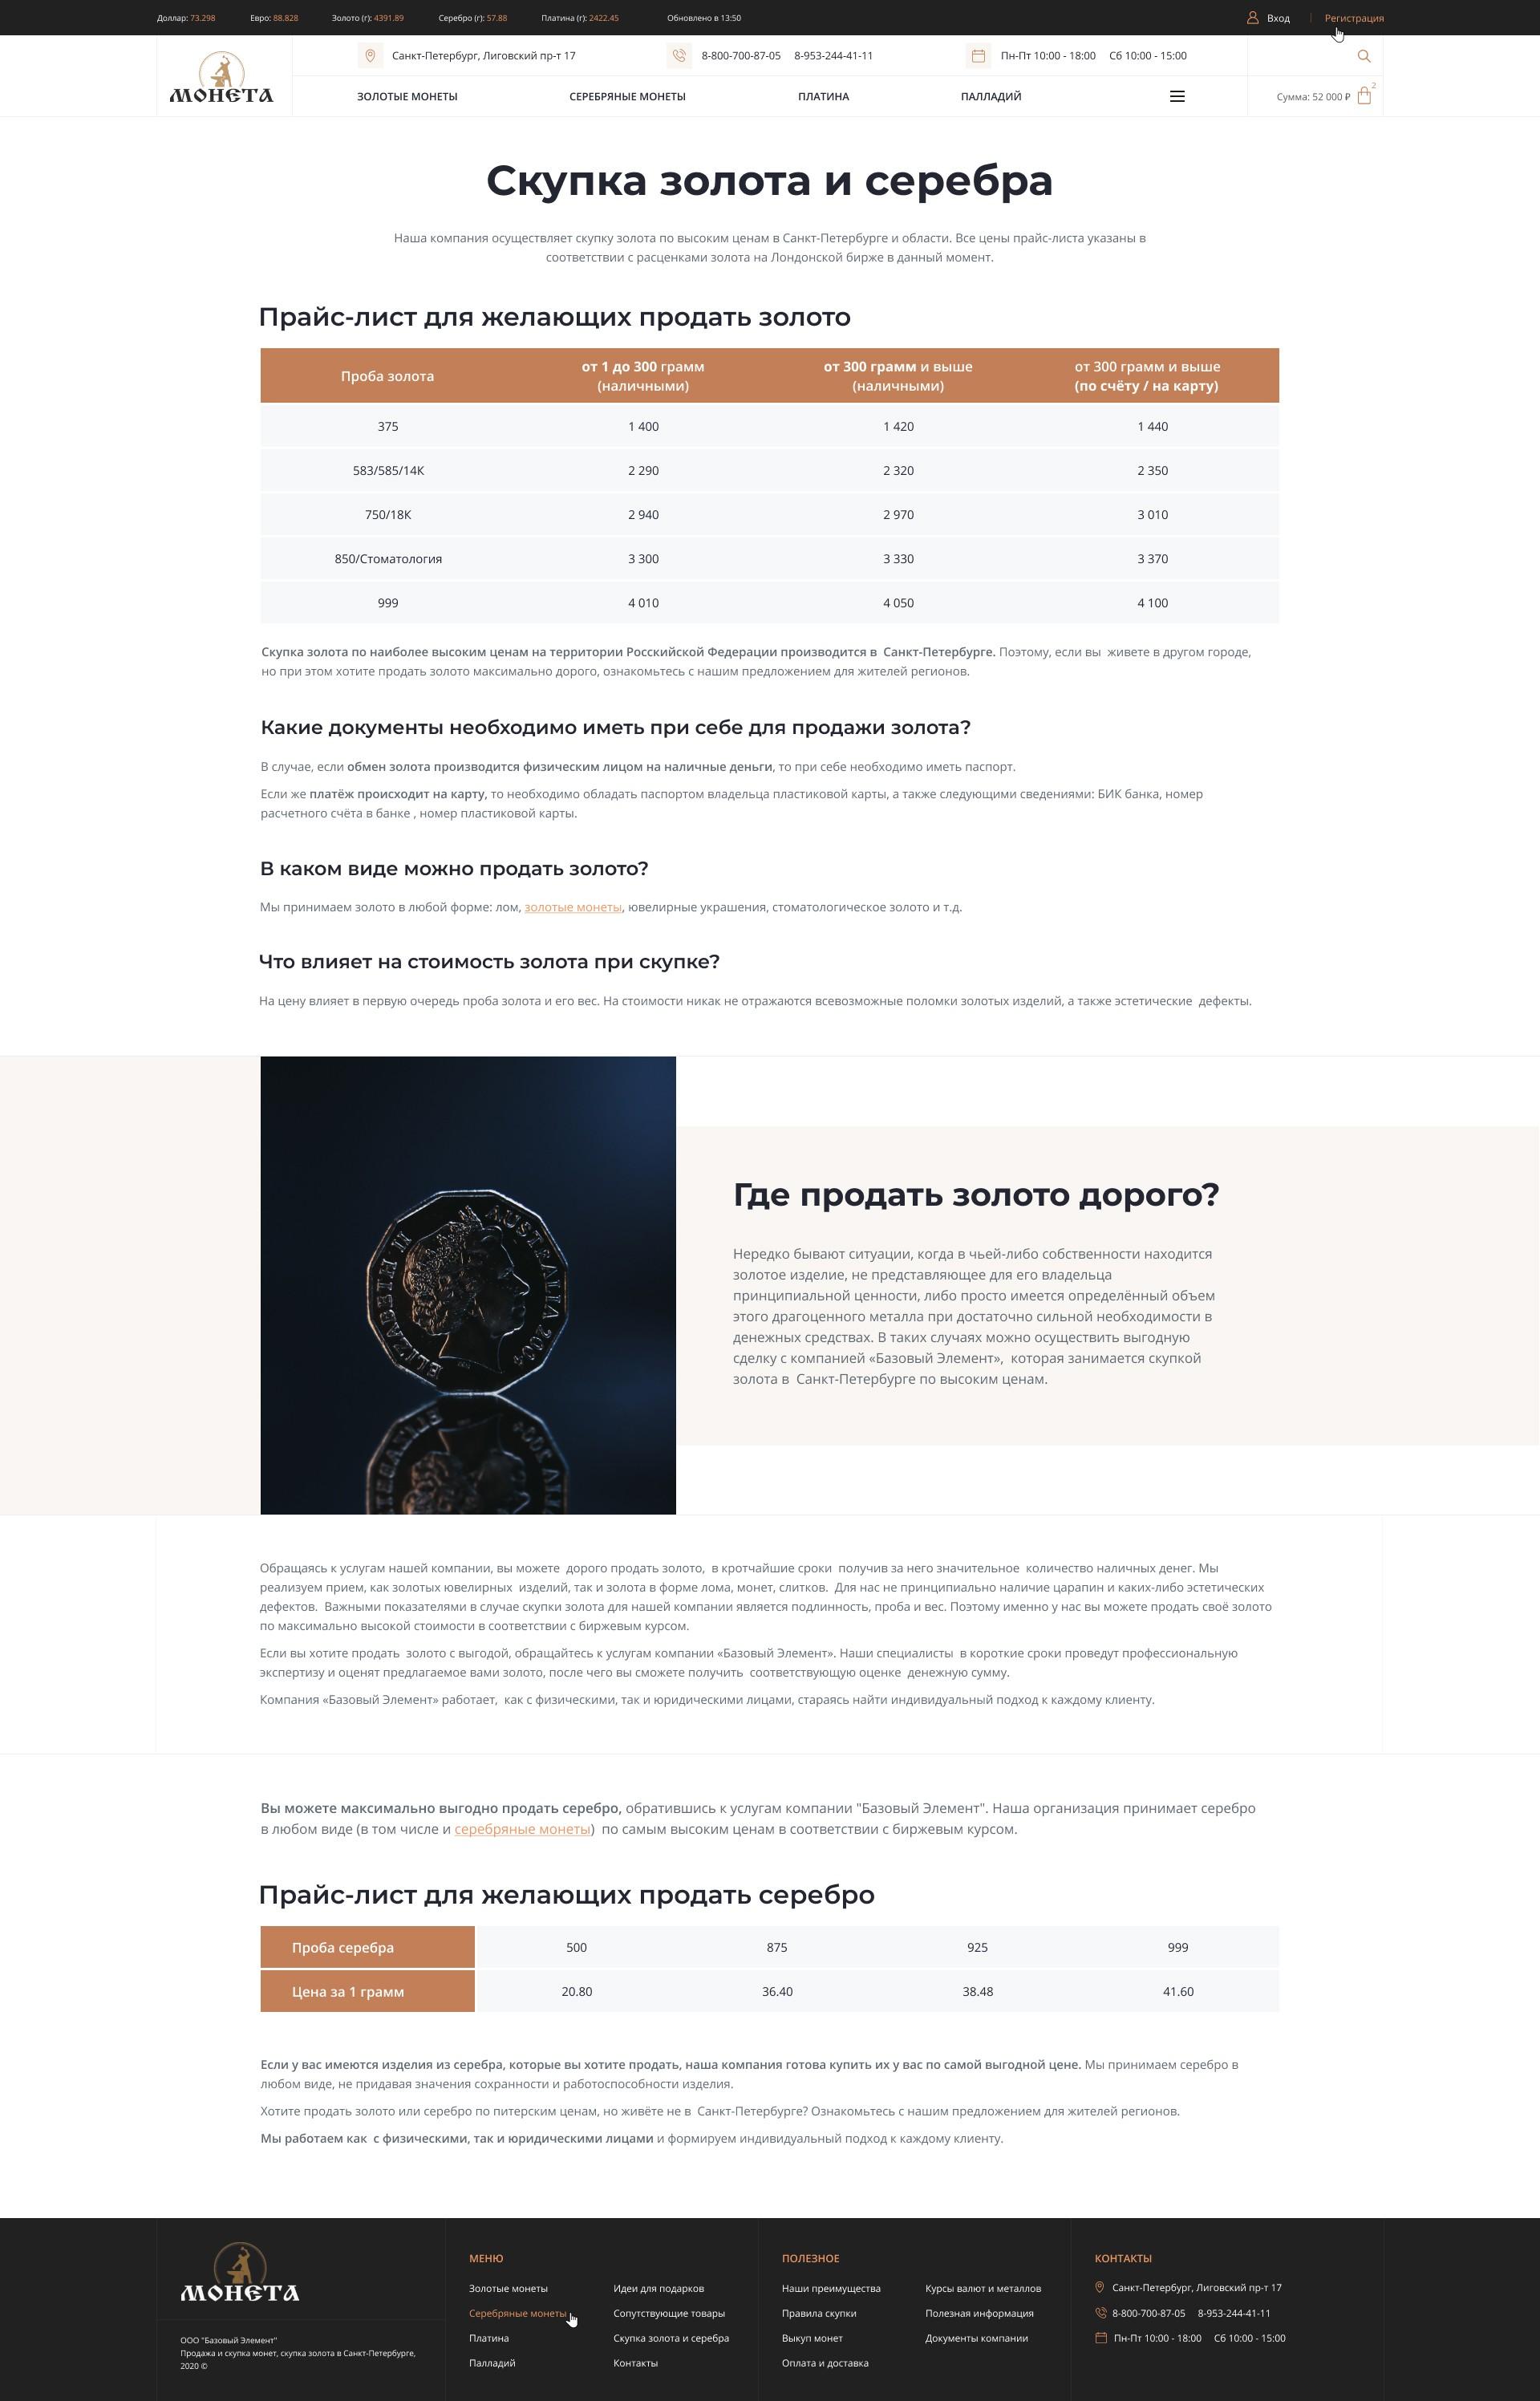 05_MonetaInvest_BuyingGoldSilver_1.0